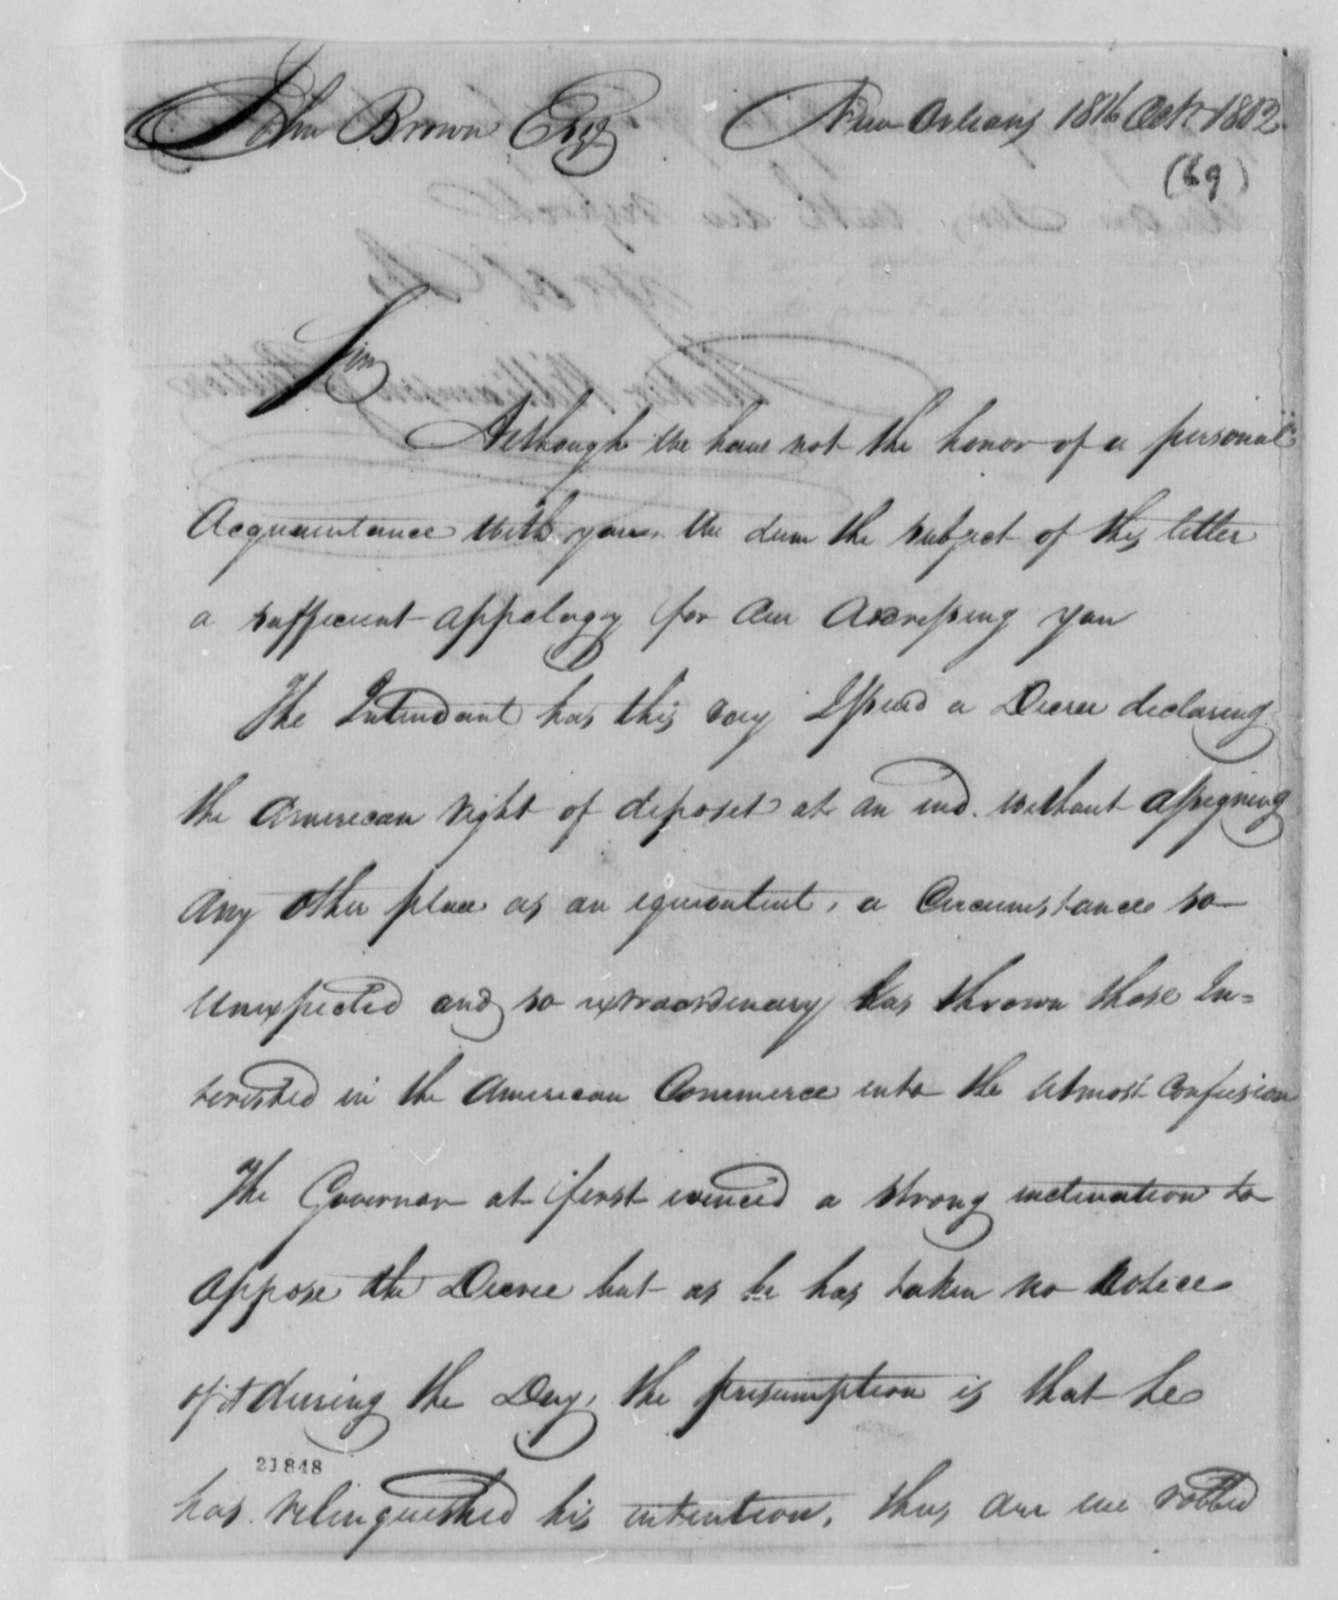 Baker-Williamson to John Brown, October 18, 1802